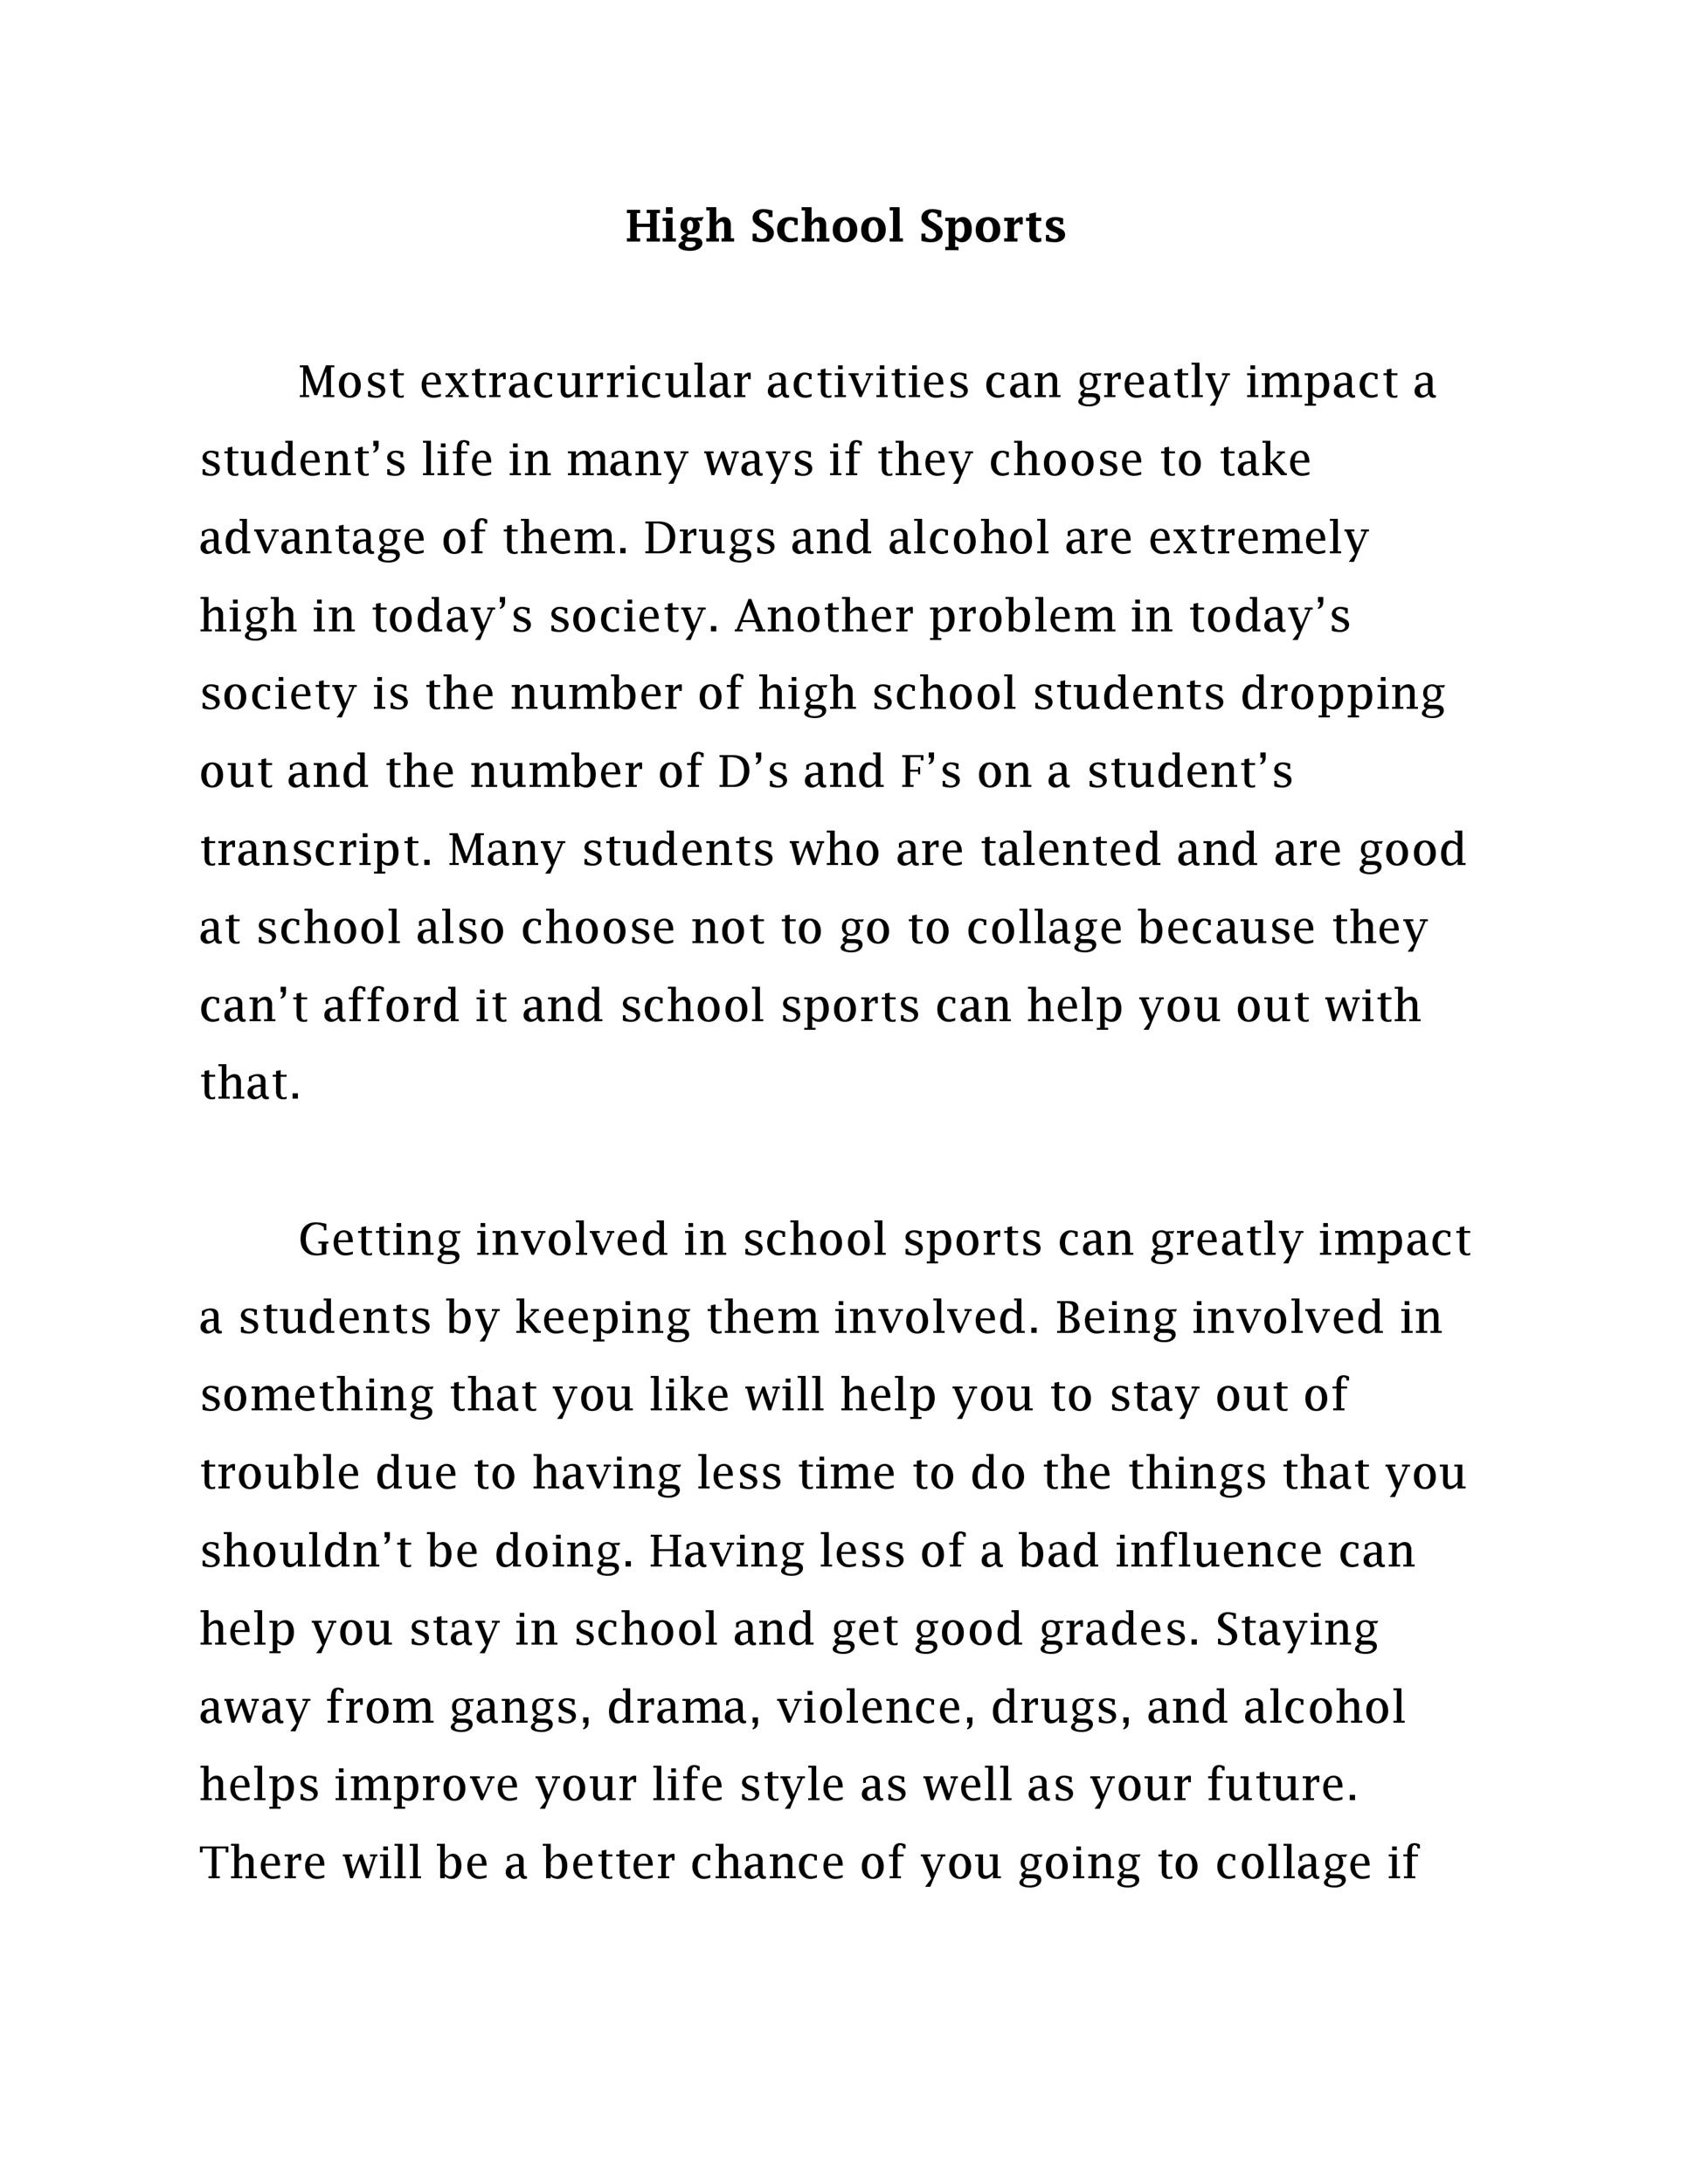 Free persuasive essay example 31